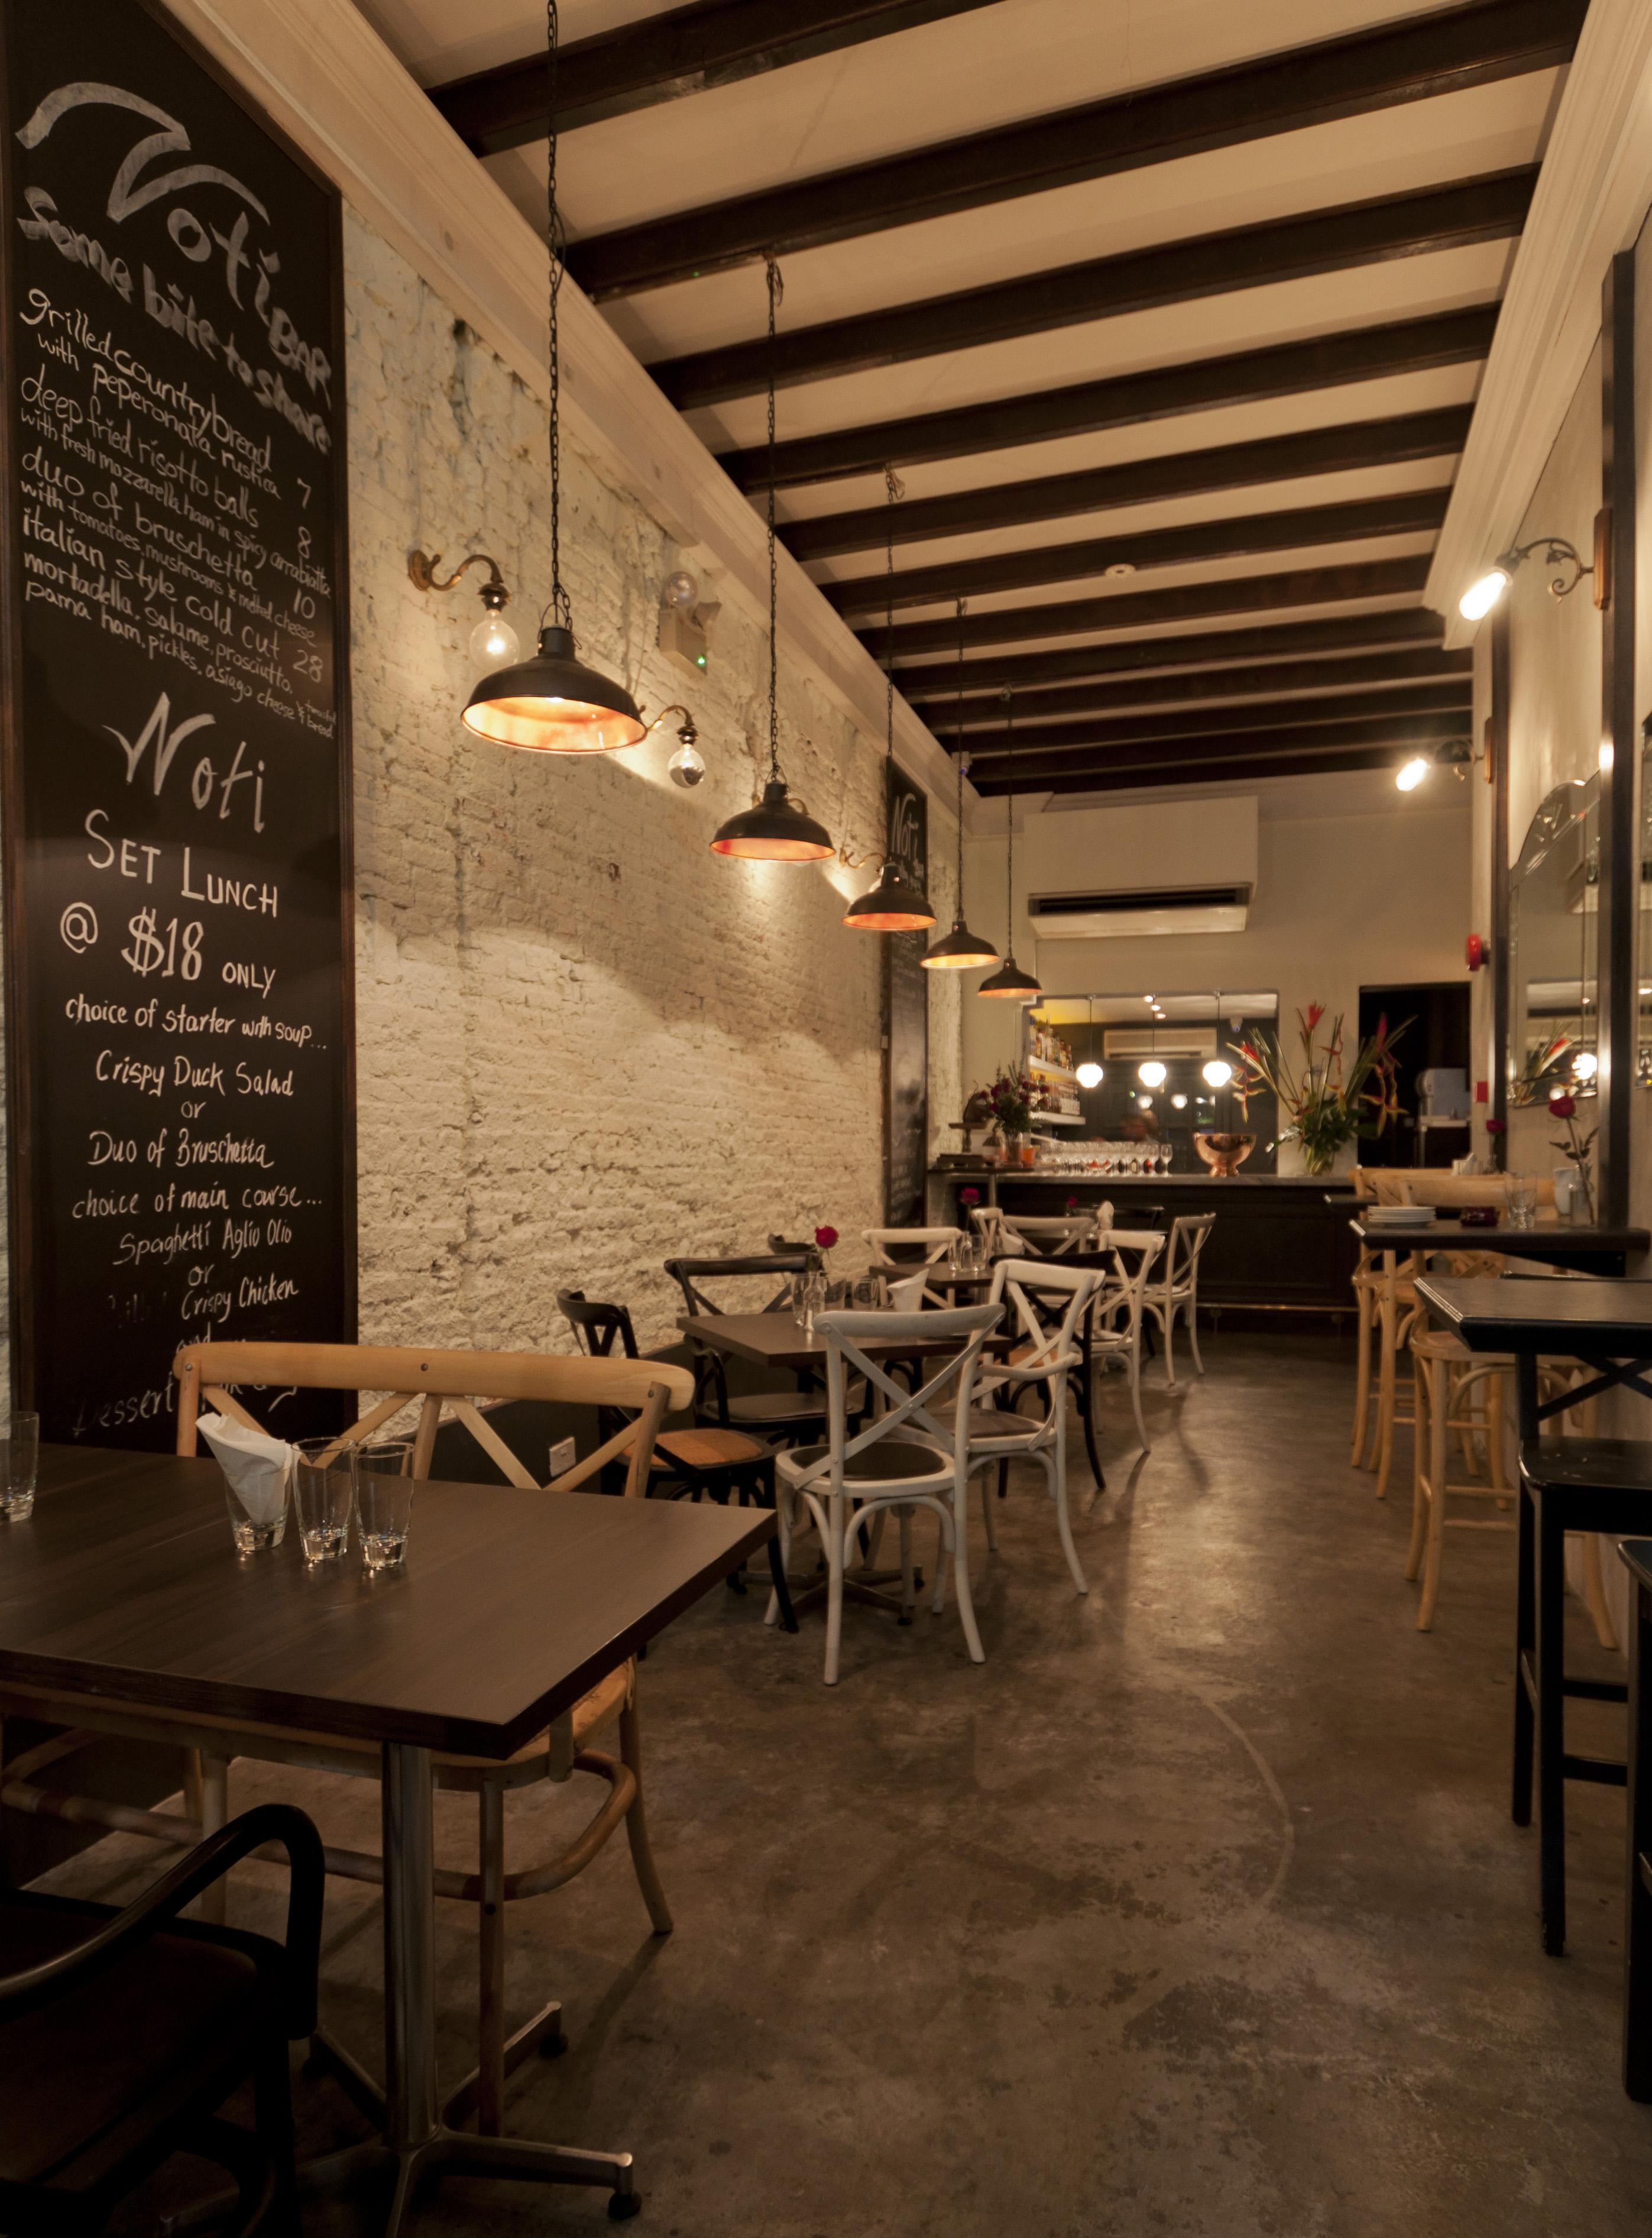 Noti Restaurant